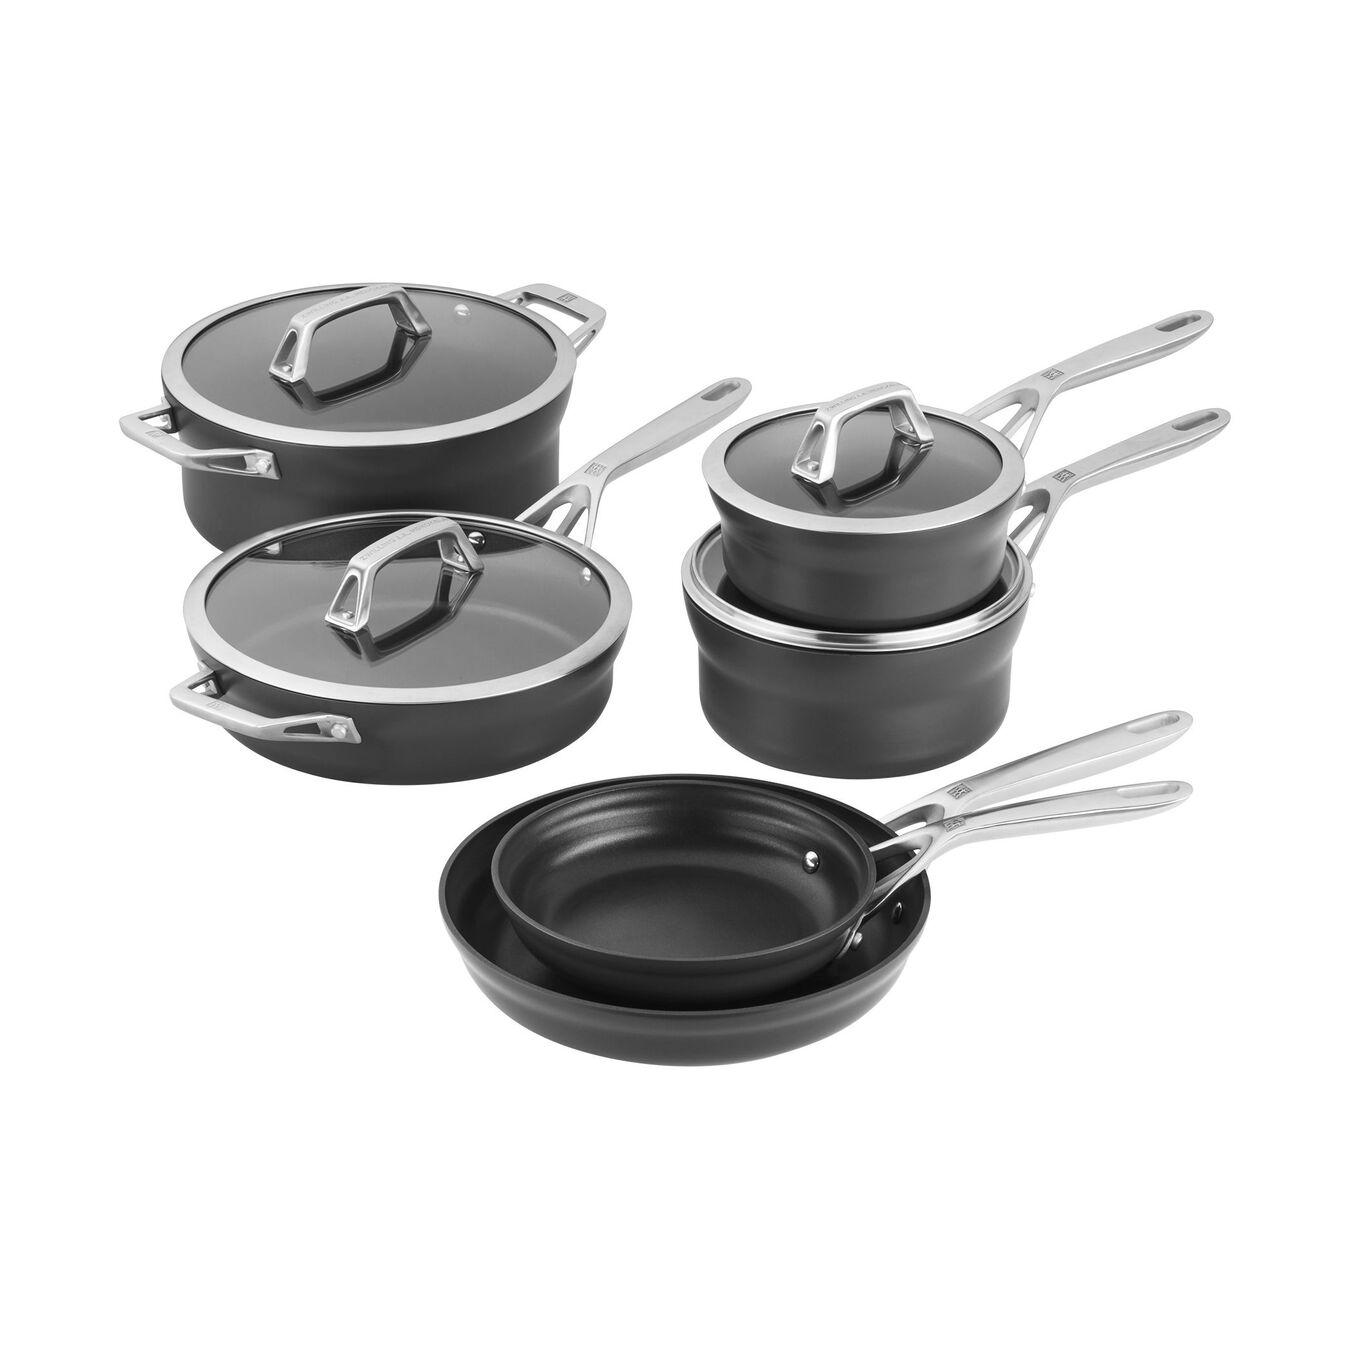 10-pc Hard Anodized Nonstick Cookware Set, aluminium ,,large 1